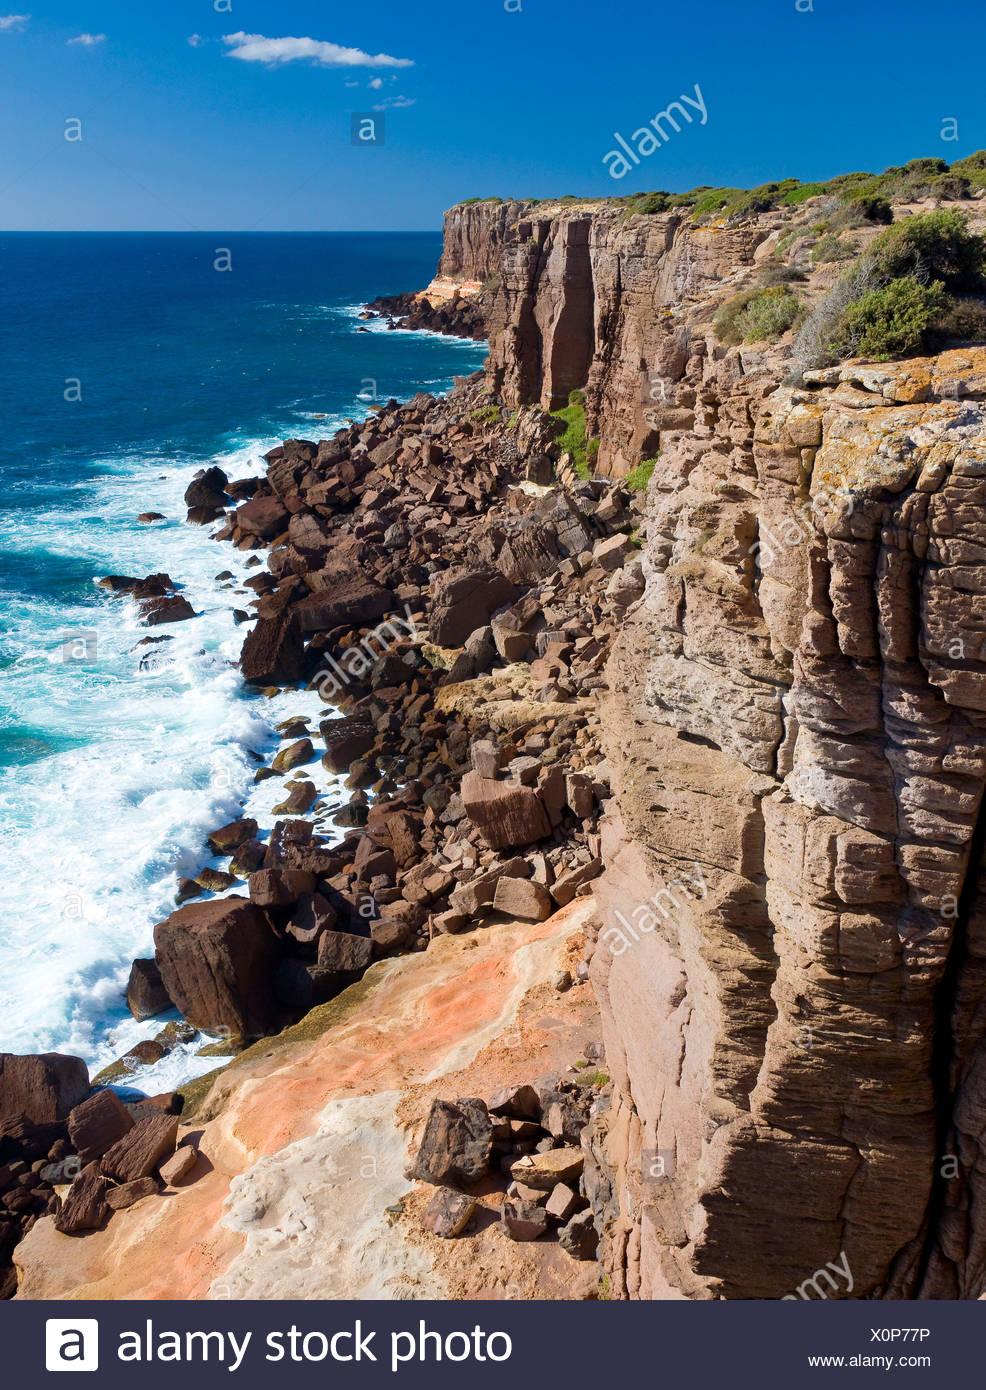 Rock formations along the Western Coast of the island Isola di Sant' Antioco, Sardinia, Italy, Europe Stock Photo